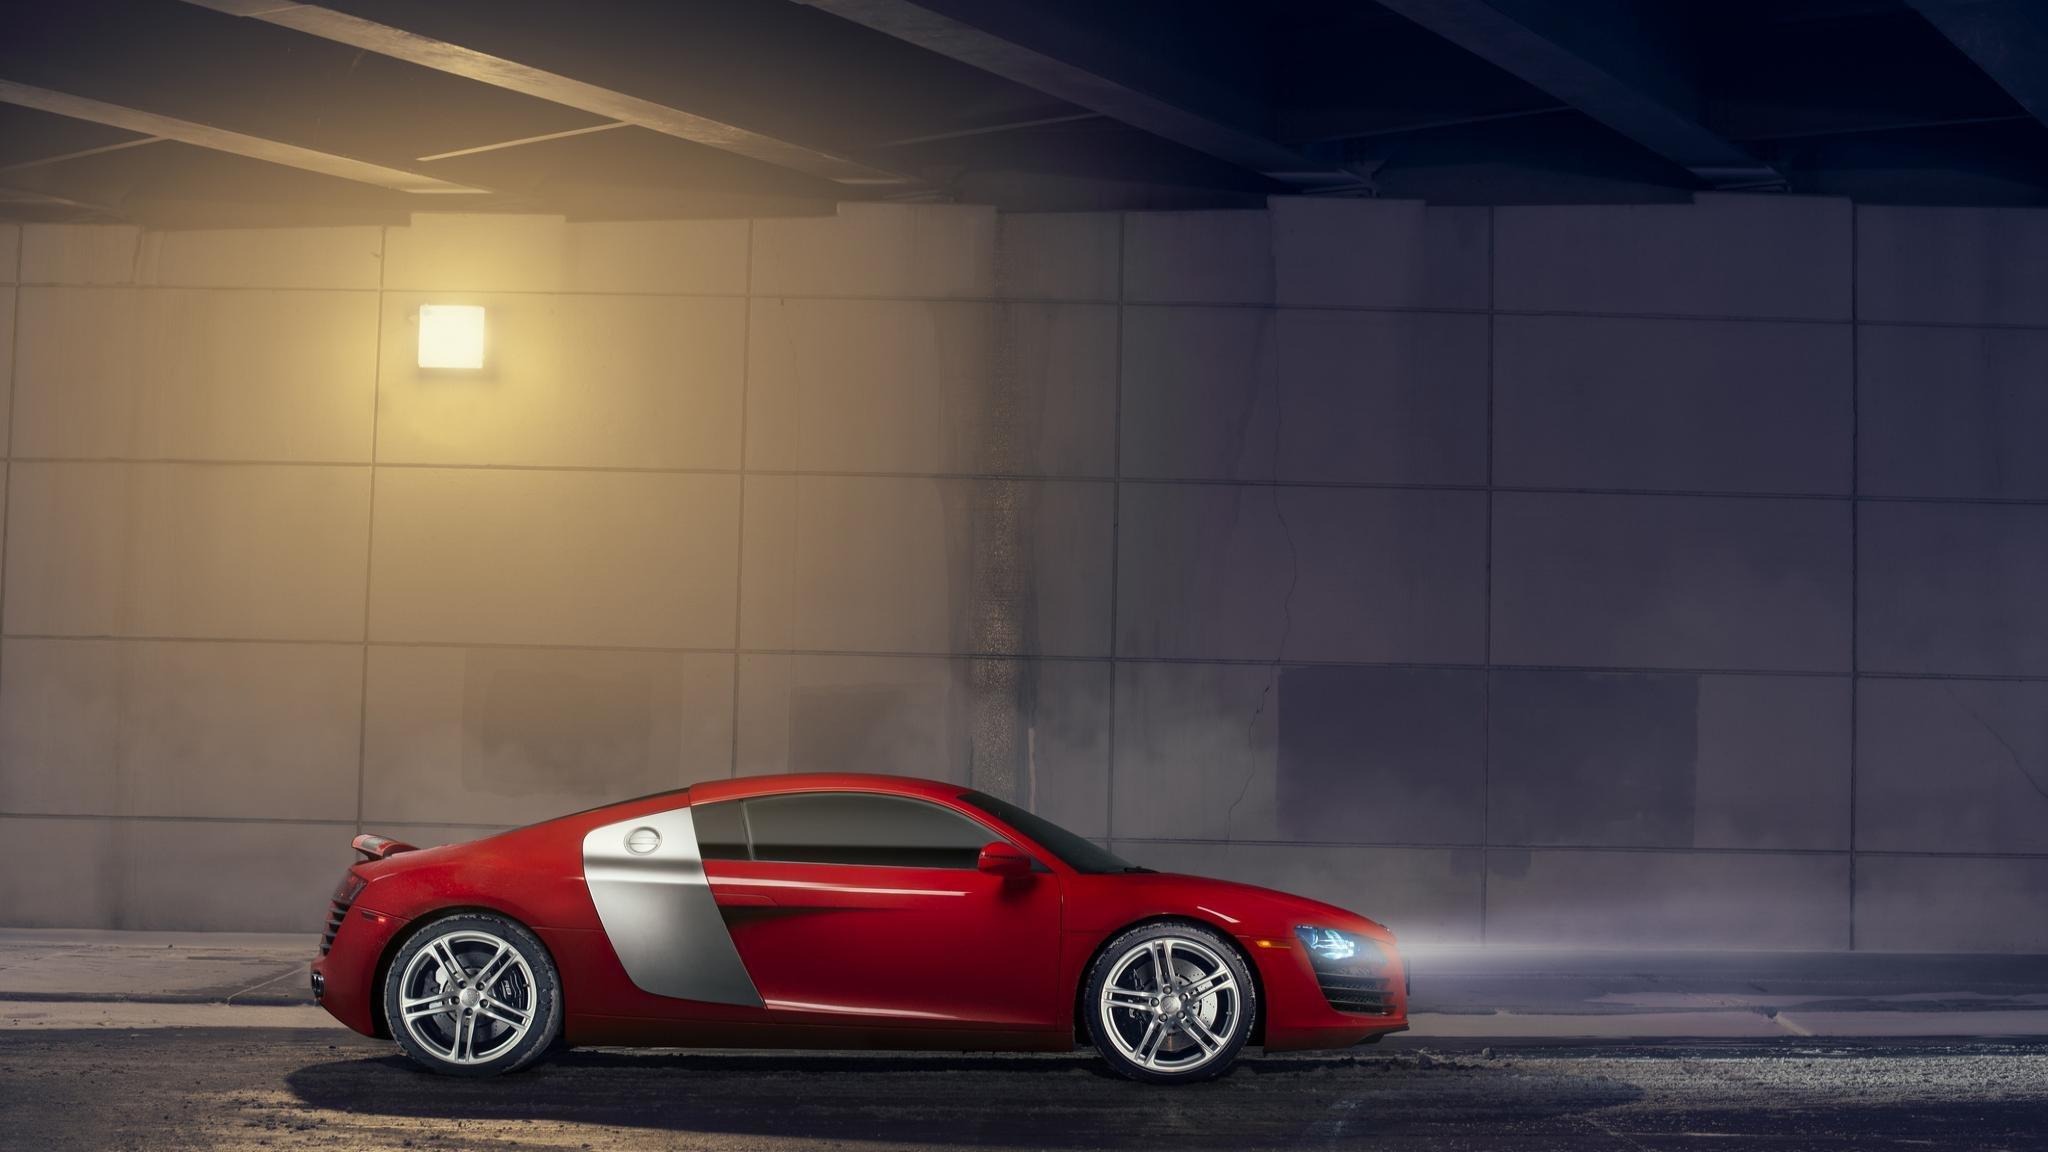 Free Download Audi R8 Wallpaper Id 452682 Hd 2048x1152 For Desktop